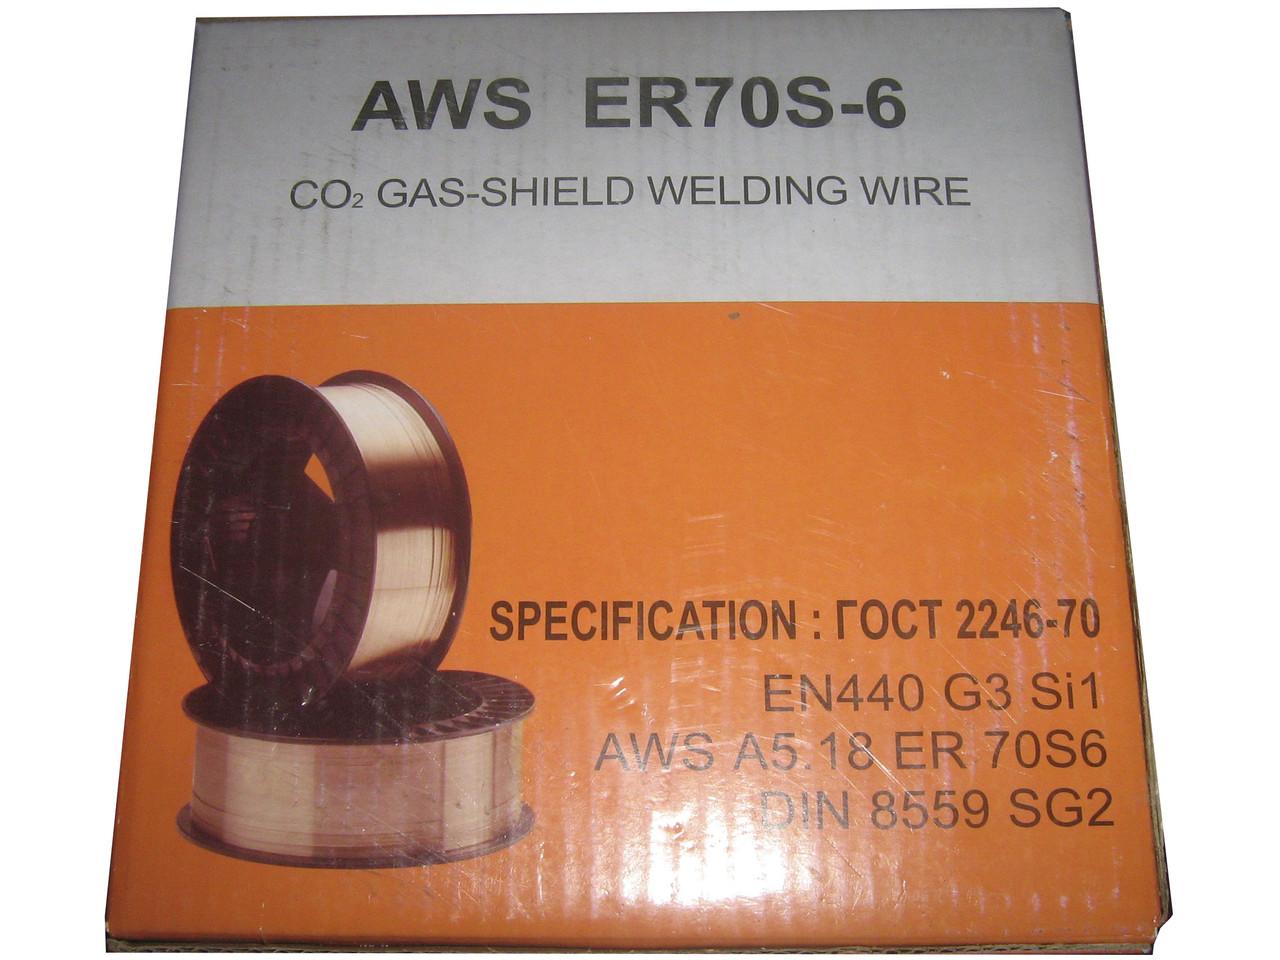 Проволка сварочная омеднённая AWS ER70S-6 0,8 мм, 15 кг